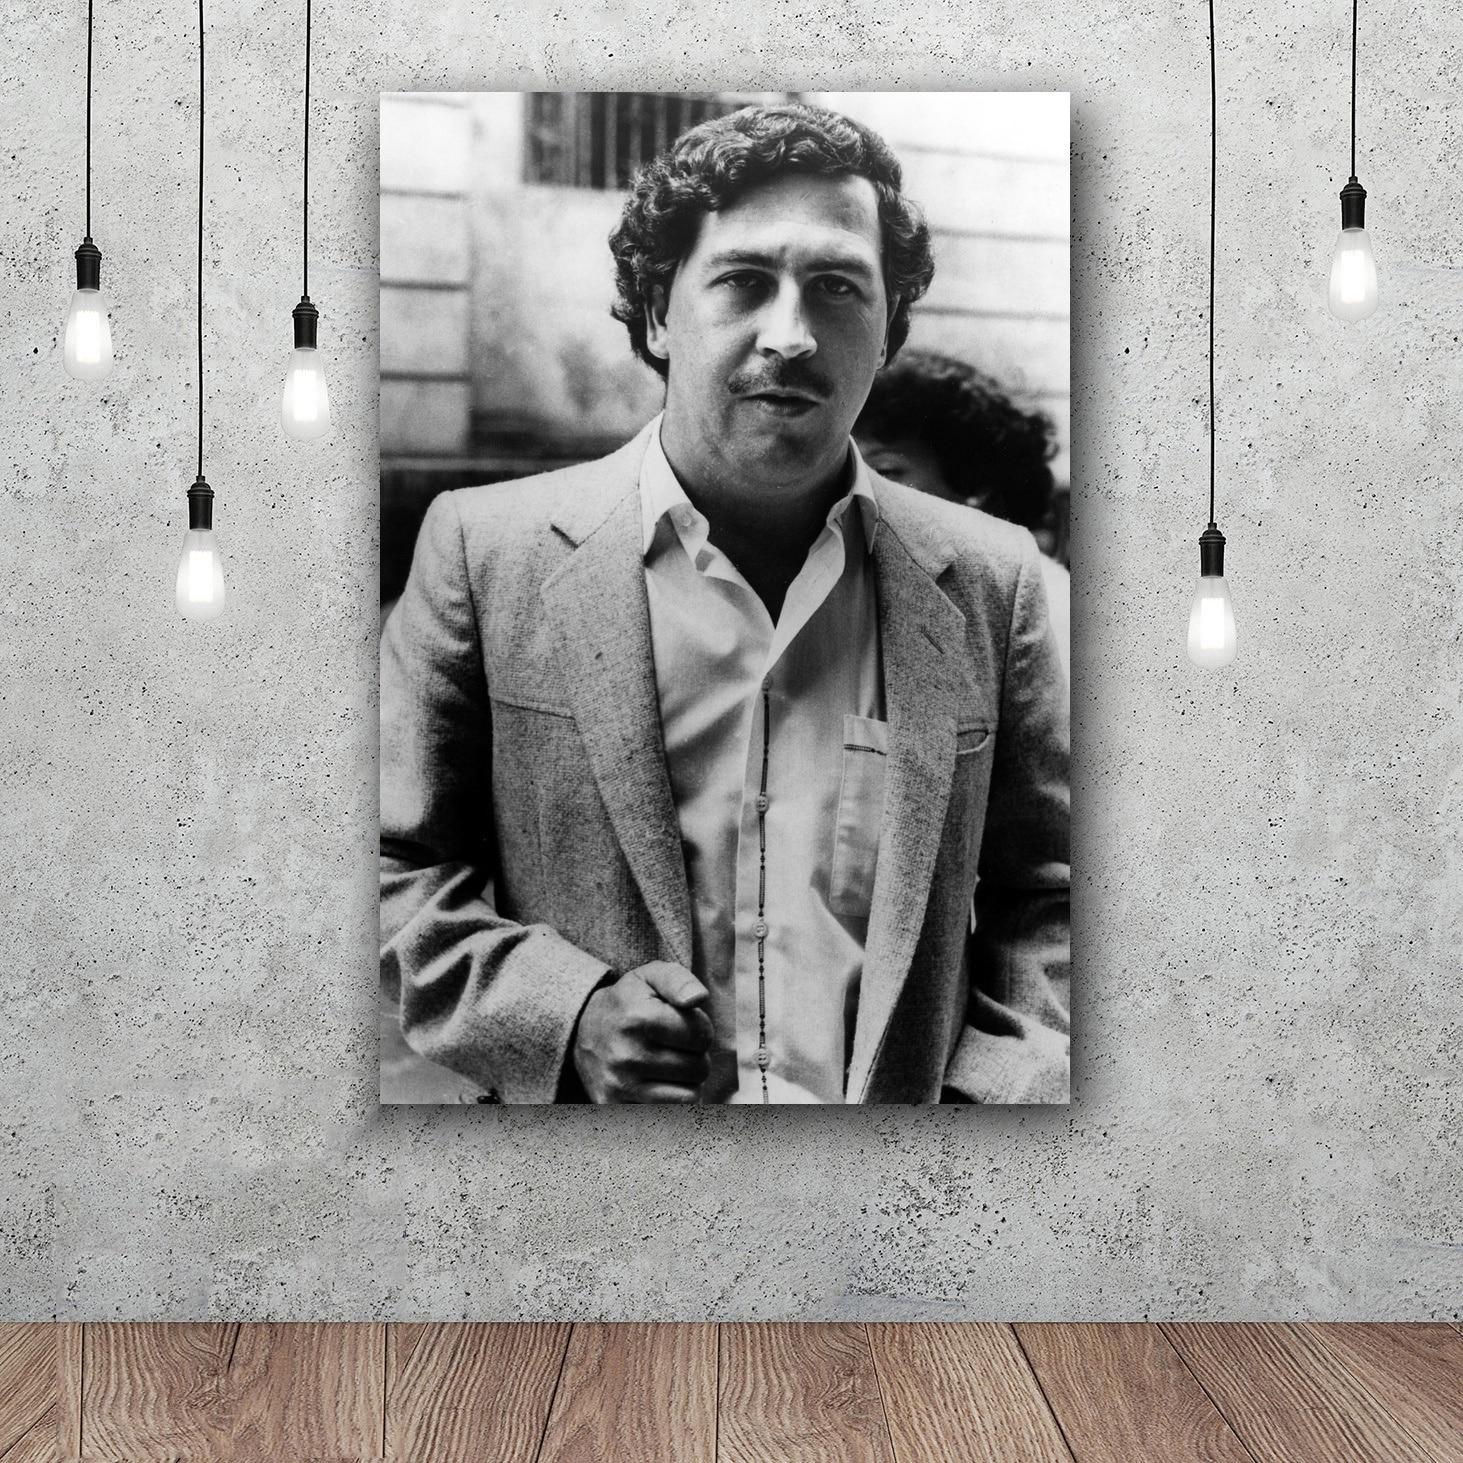 Pablo Escobar Art Silk Fabric Poster Wall 12x18 24x36inch